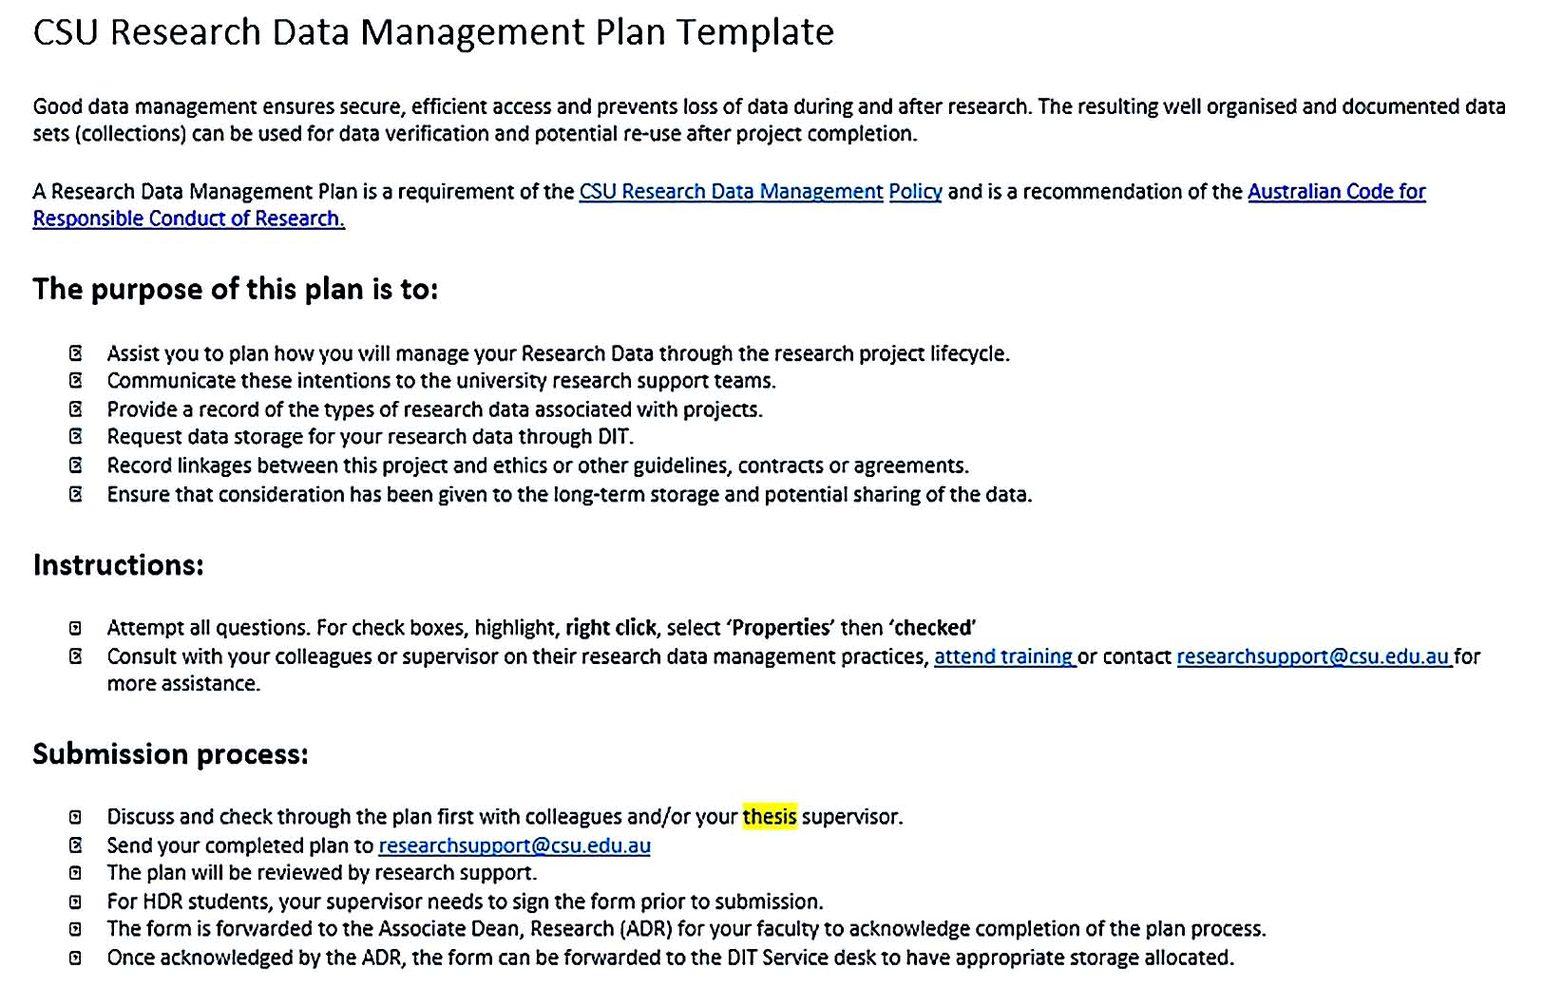 Research Data Management Plan